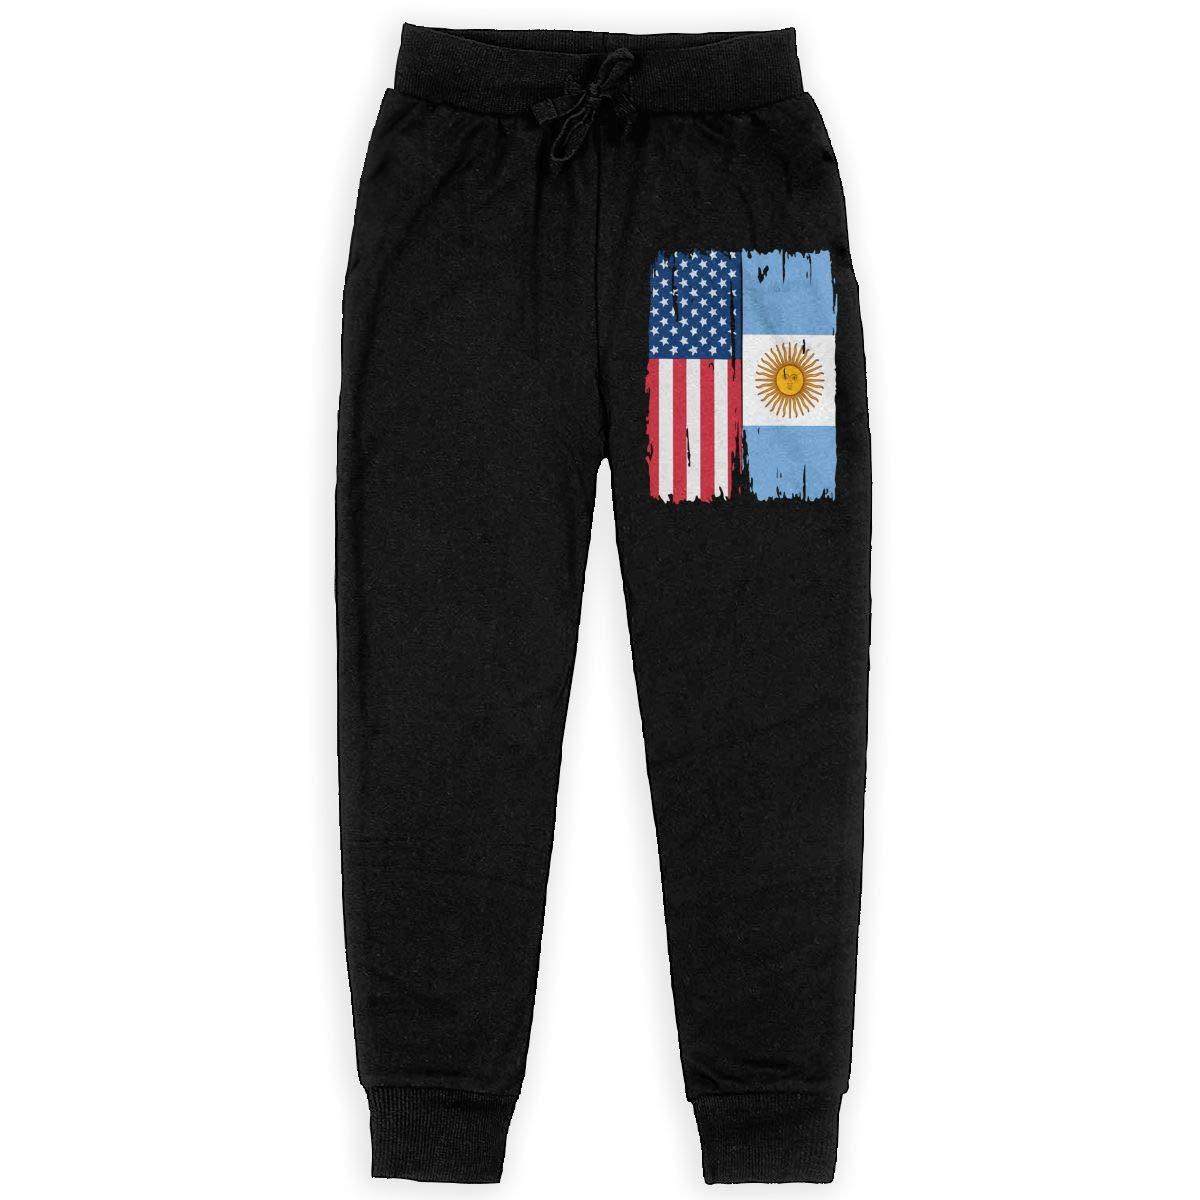 WYZVK22 American Argentina Flag Soft//Cozy Sweatpants Boys Jogger Pants for Teen Girls